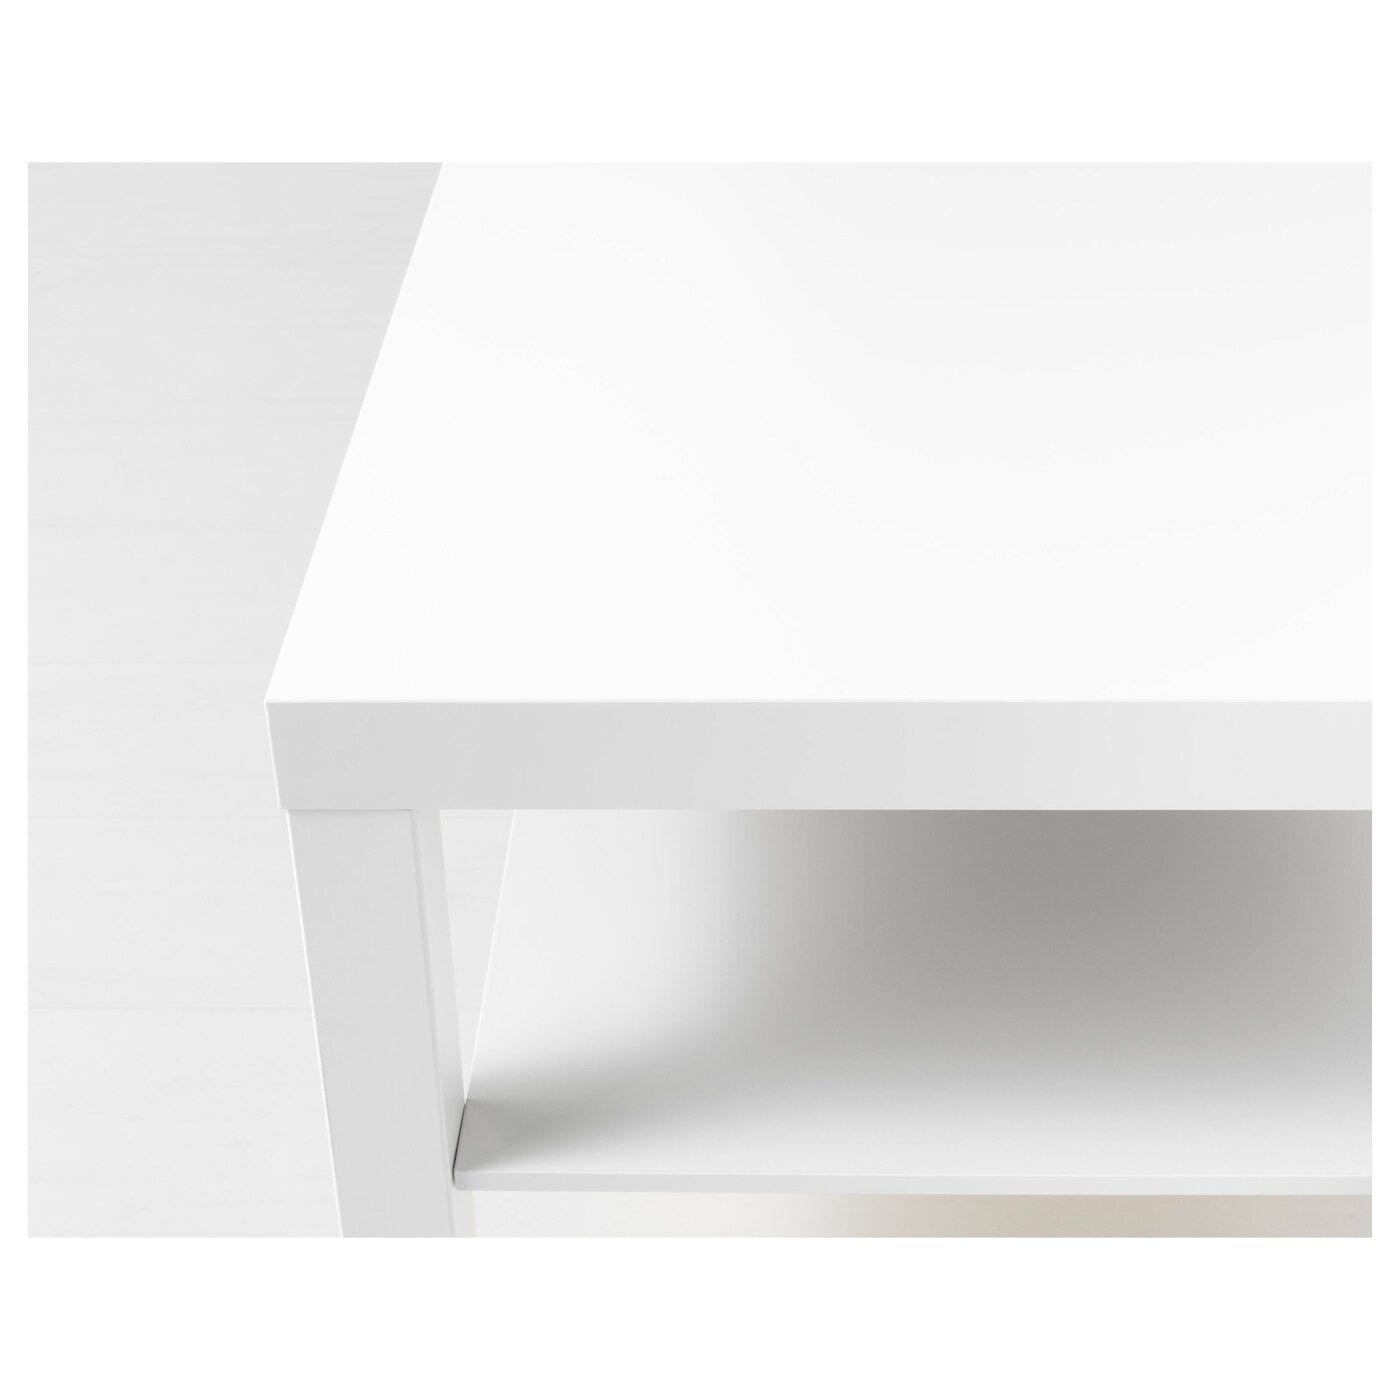 Lack Coffee Table White 35x22x18 Ikea Lack Coffee Table Ikea Lack Coffee Table Coffee Table White [ 1400 x 1400 Pixel ]